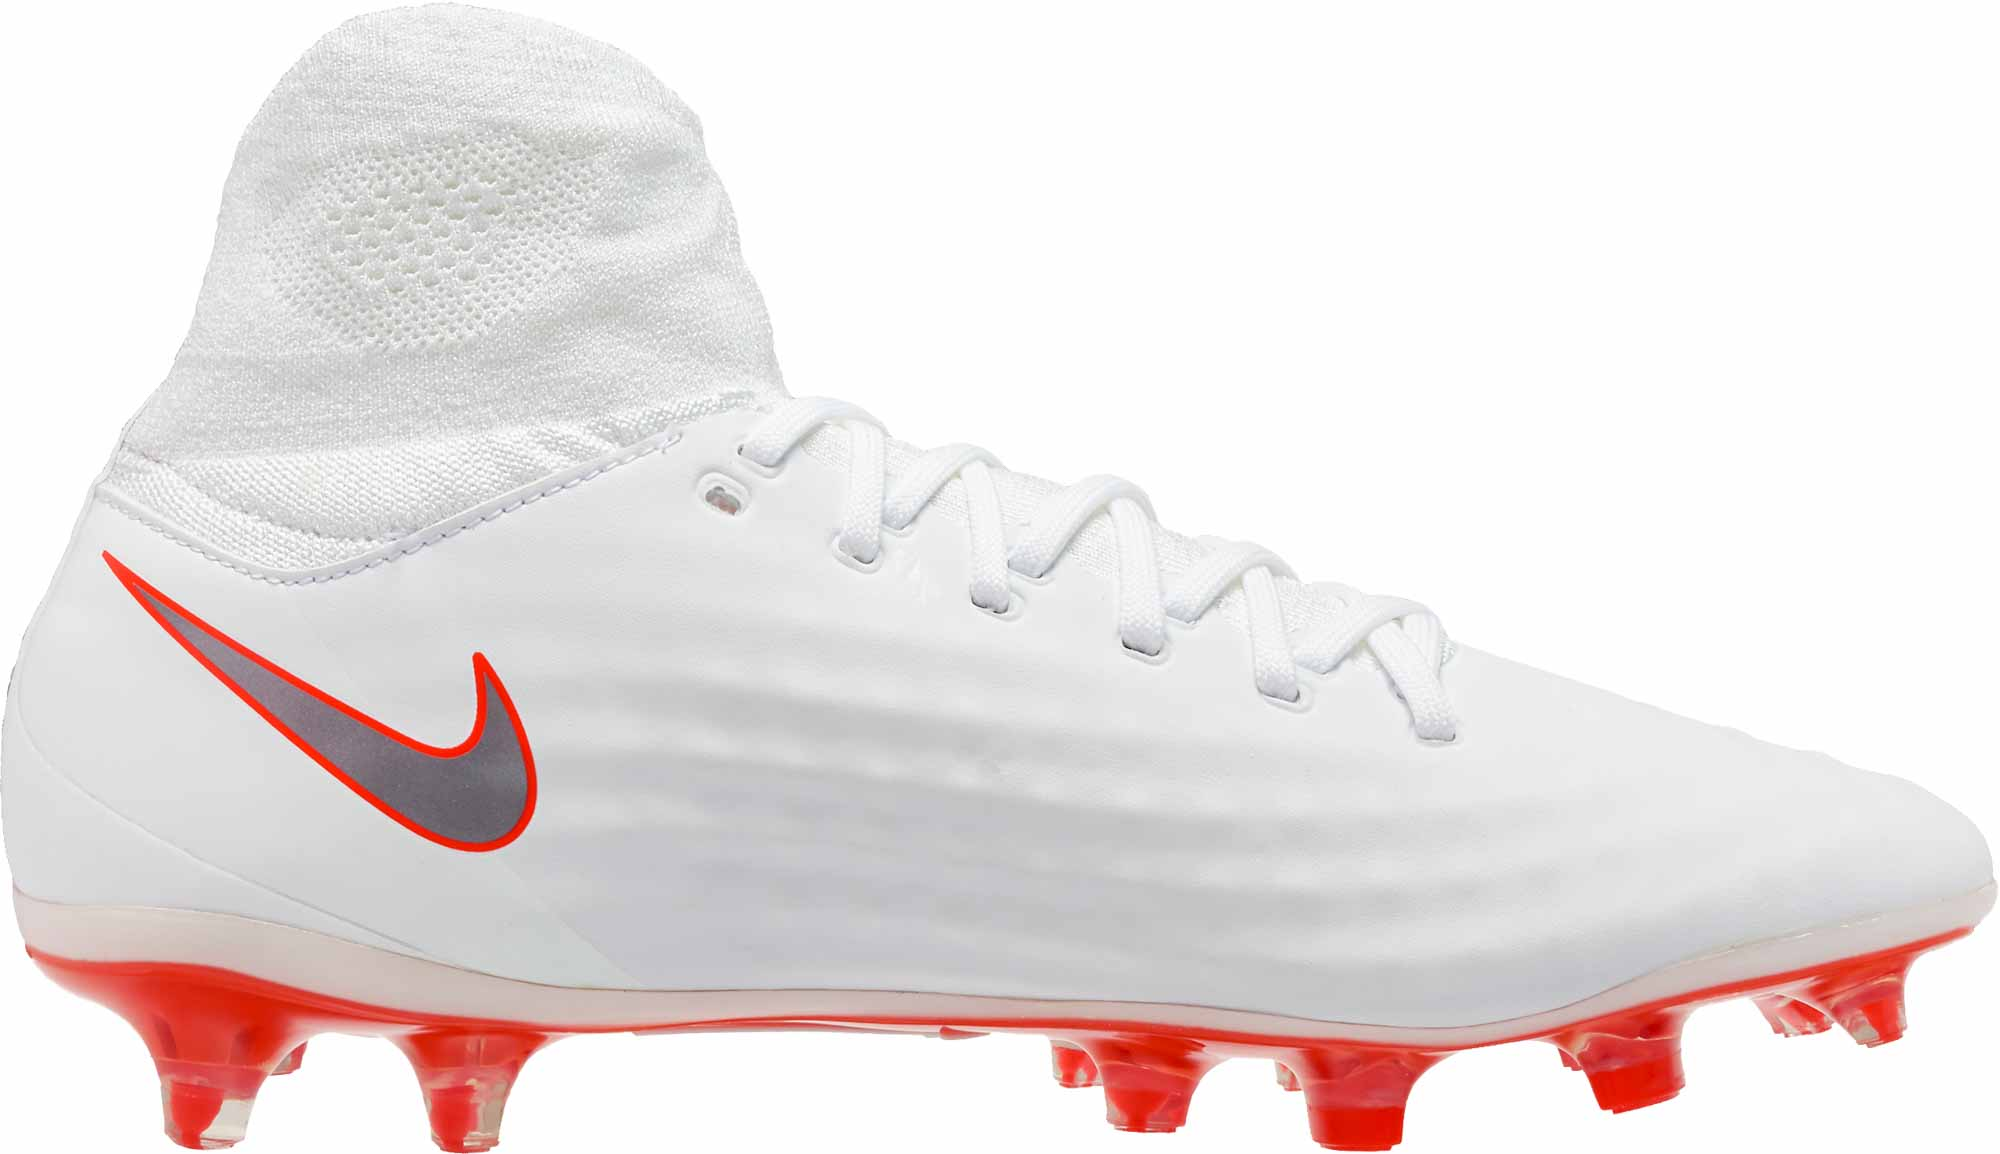 775978af8fa2 Nike Magista Obra II Pro DF FG - White/Metallic Cool Grey - SoccerPro